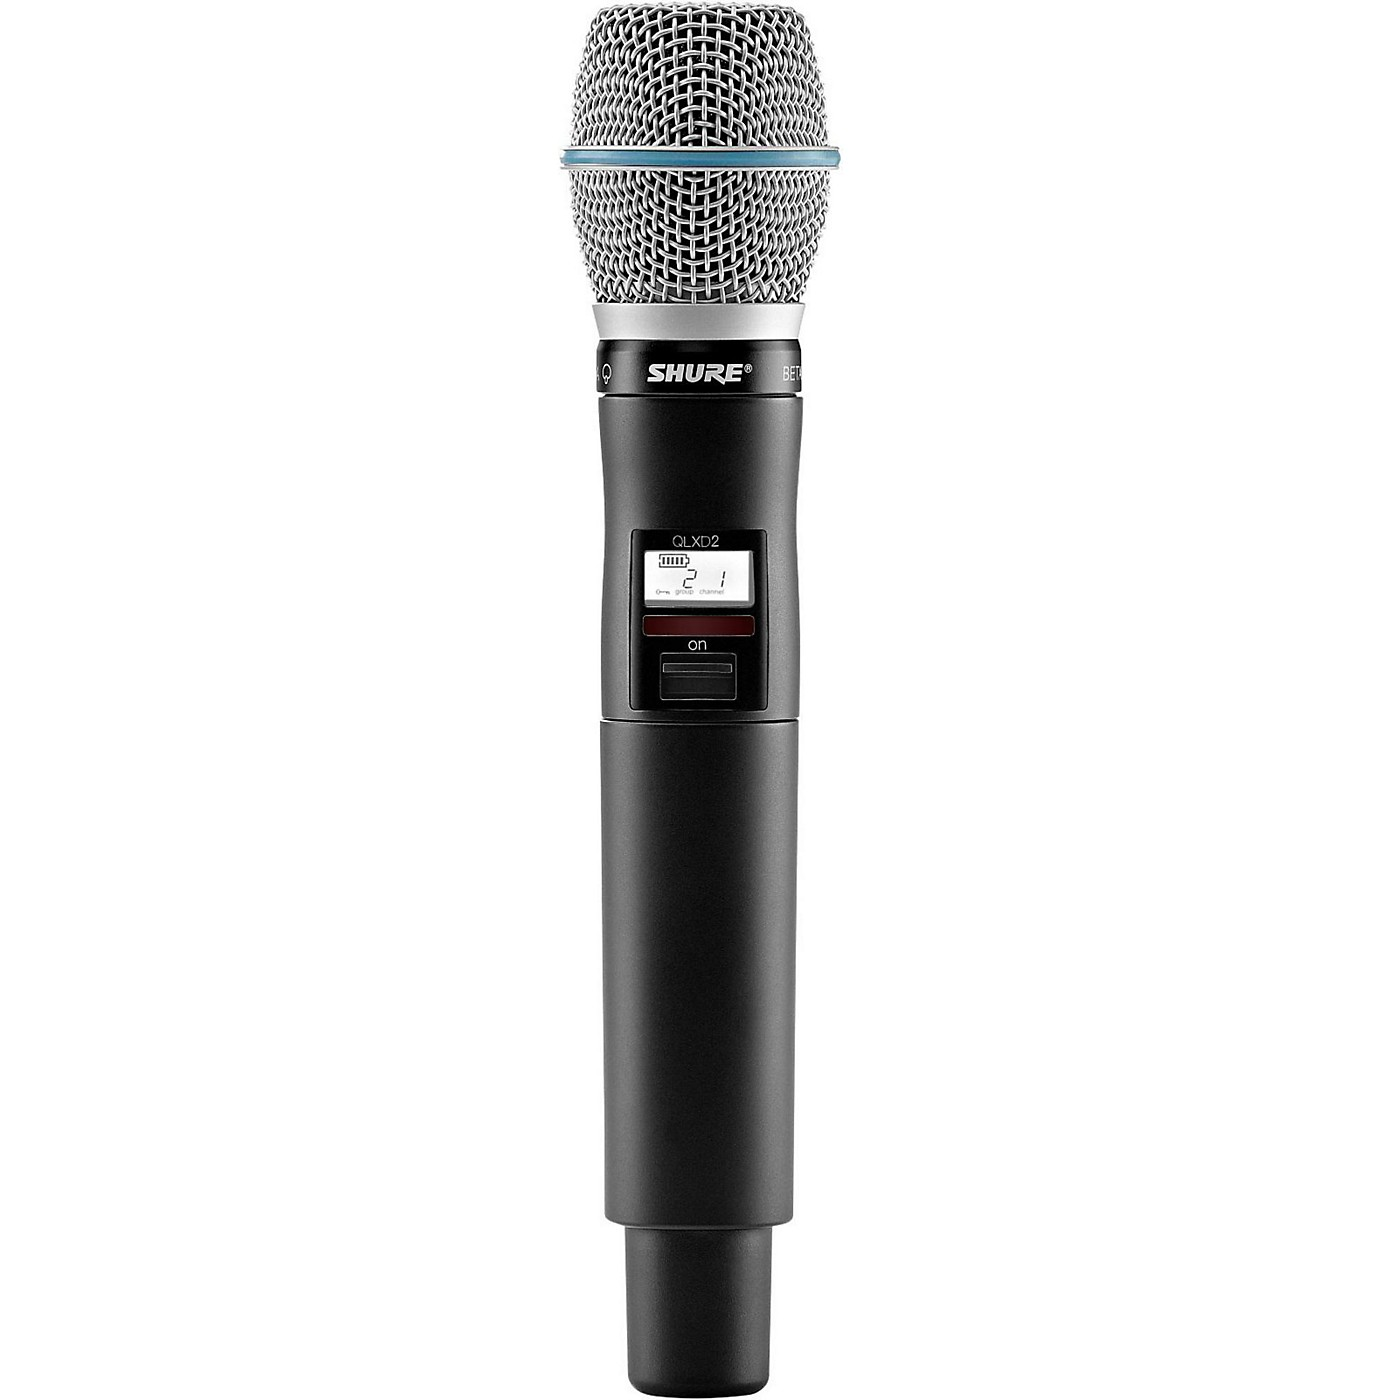 Shure QLXD2/B87C Handheld Wireless Microphone Transmitter thumbnail